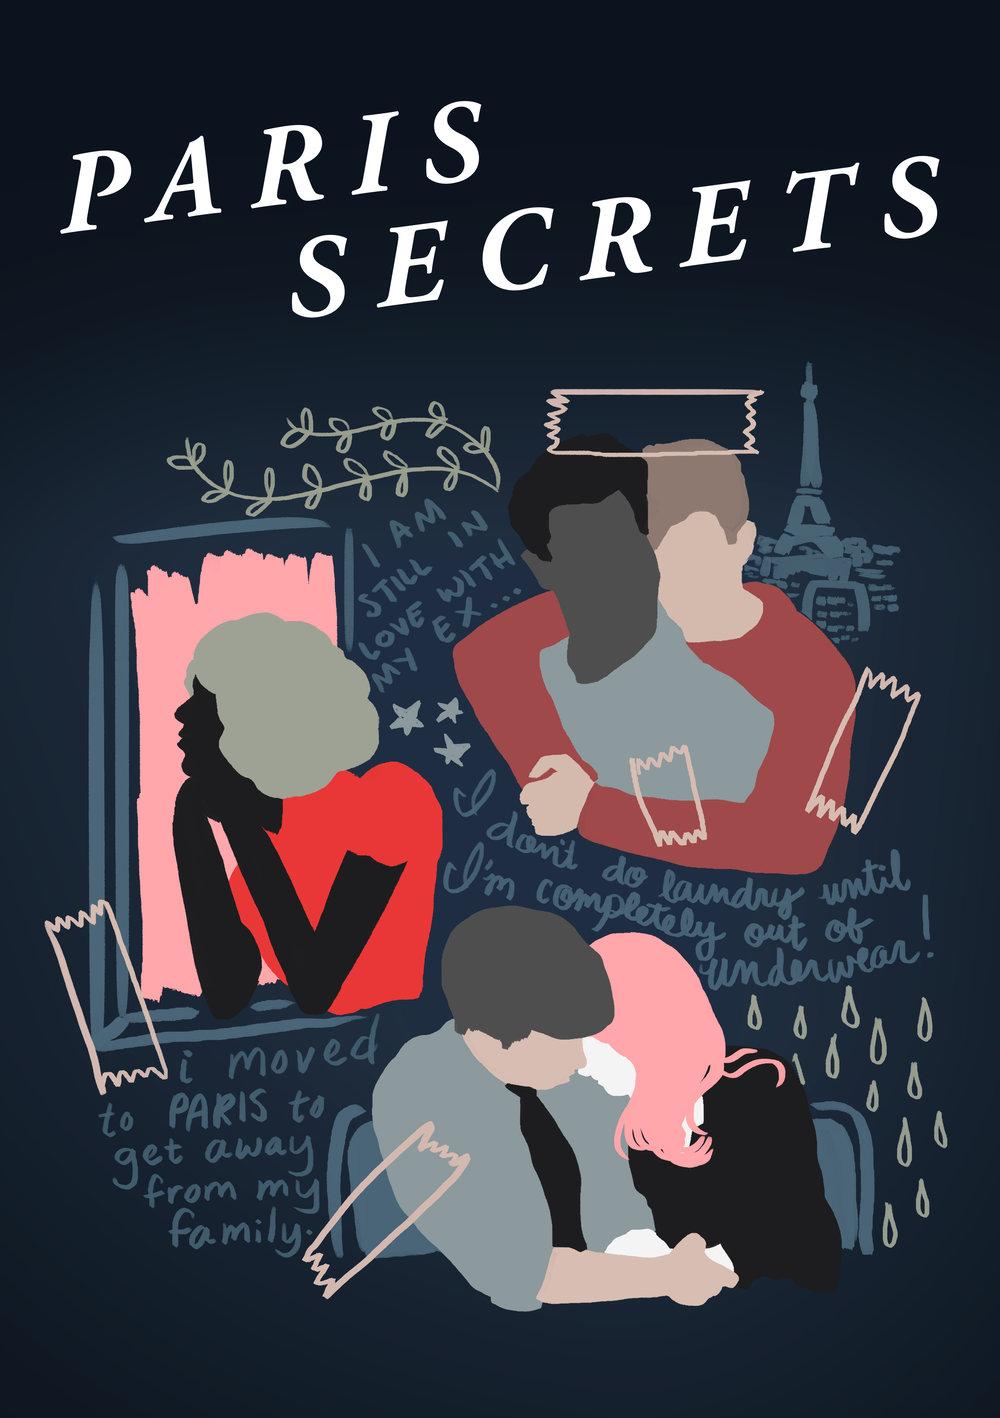 paris secrets.jpg